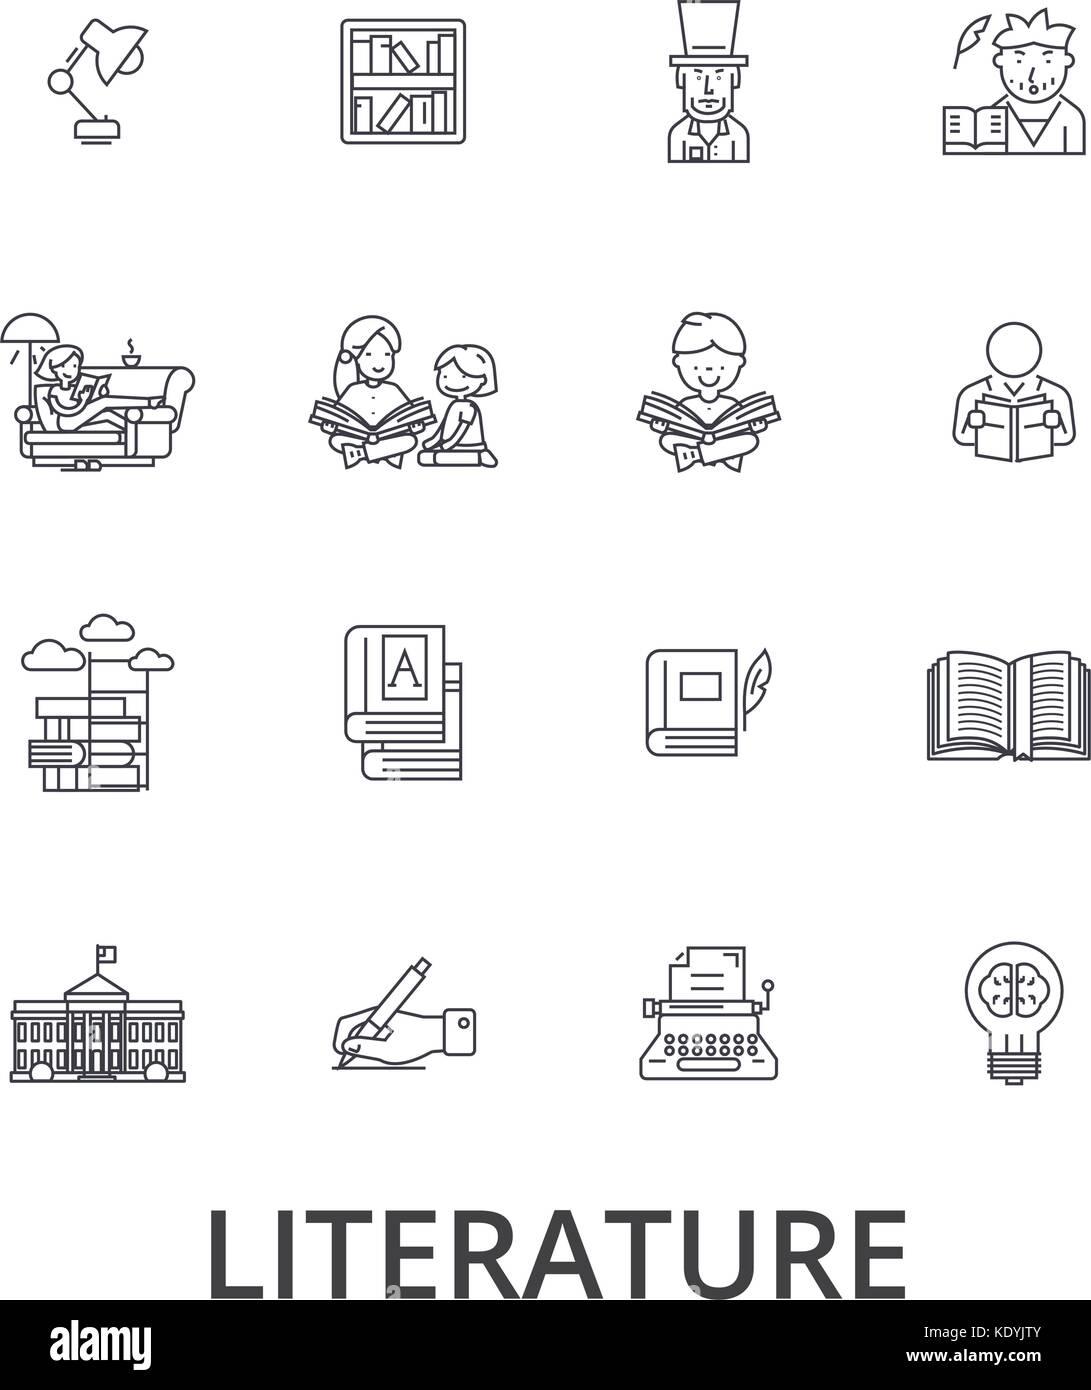 Litterature Livre Ecriture Bibliotheque Musique Lecture